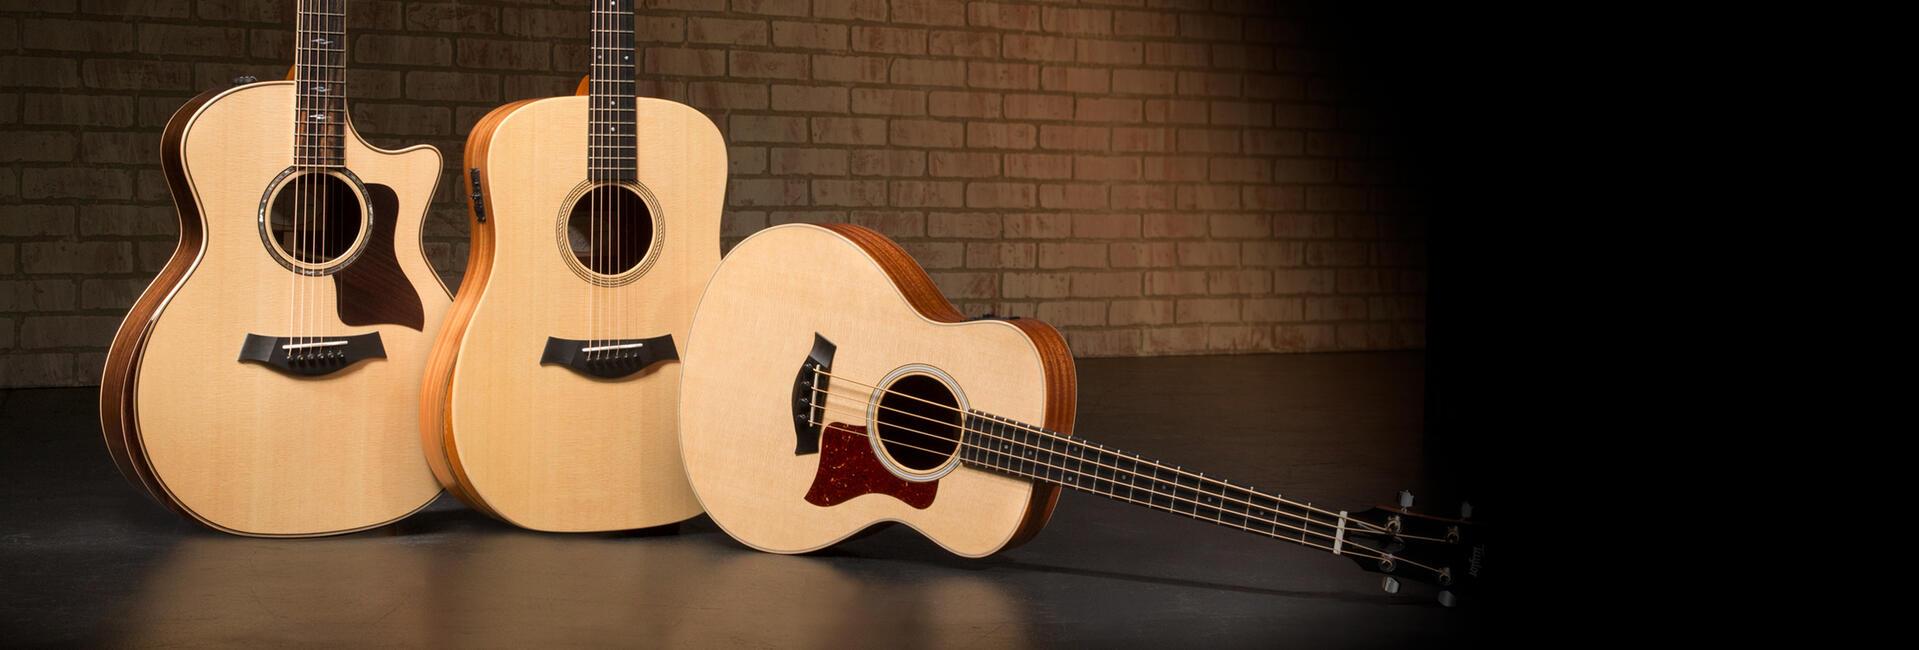 Acoustic guitars taylor guitars for Youtube certified mechanic shirt